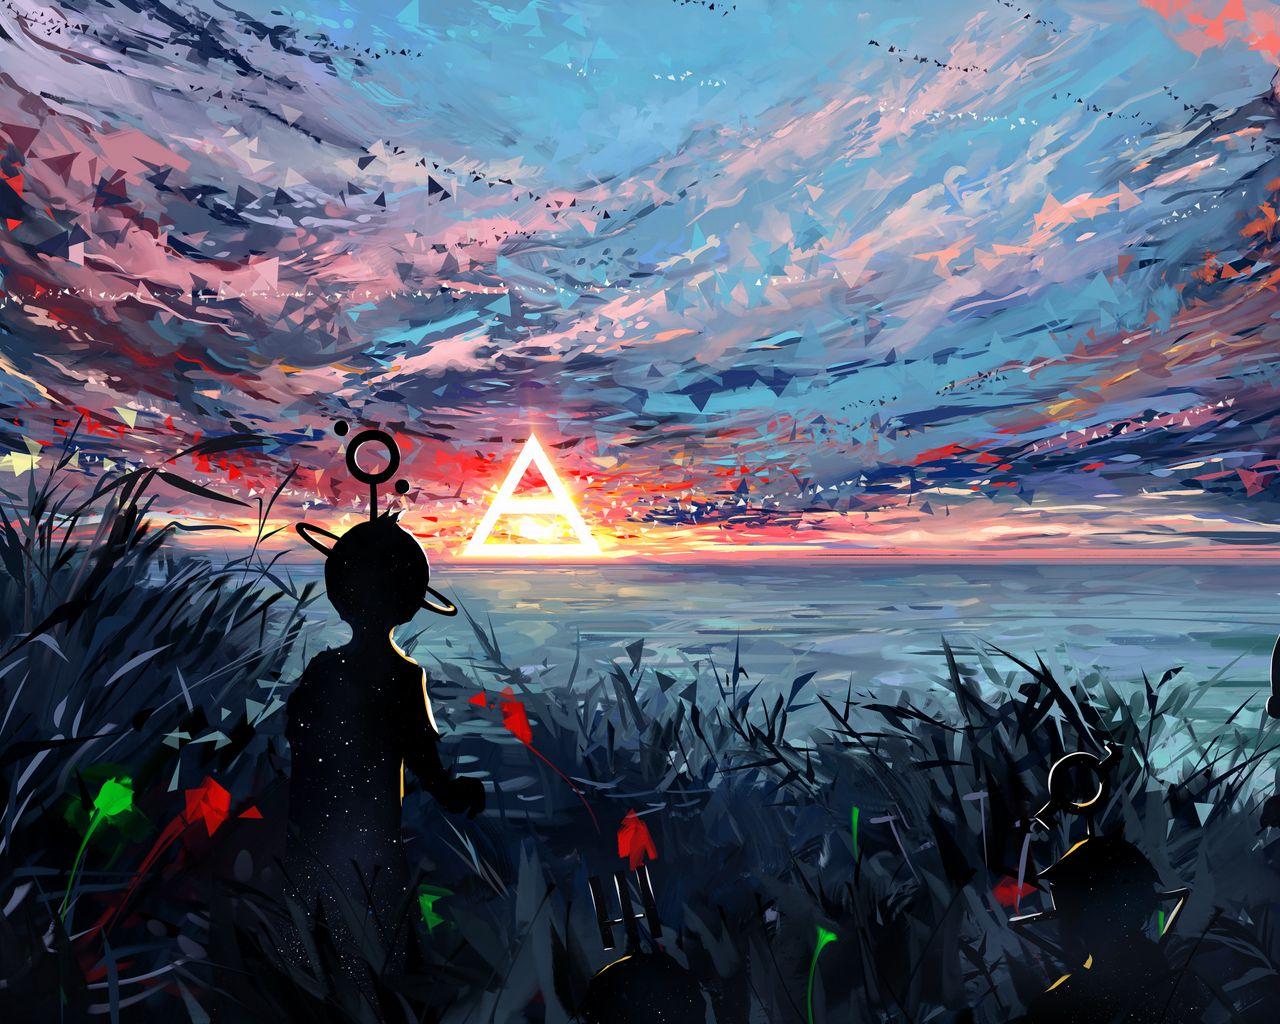 1280x1024 Wallpaper silhouette, art, sky, spots, colorful